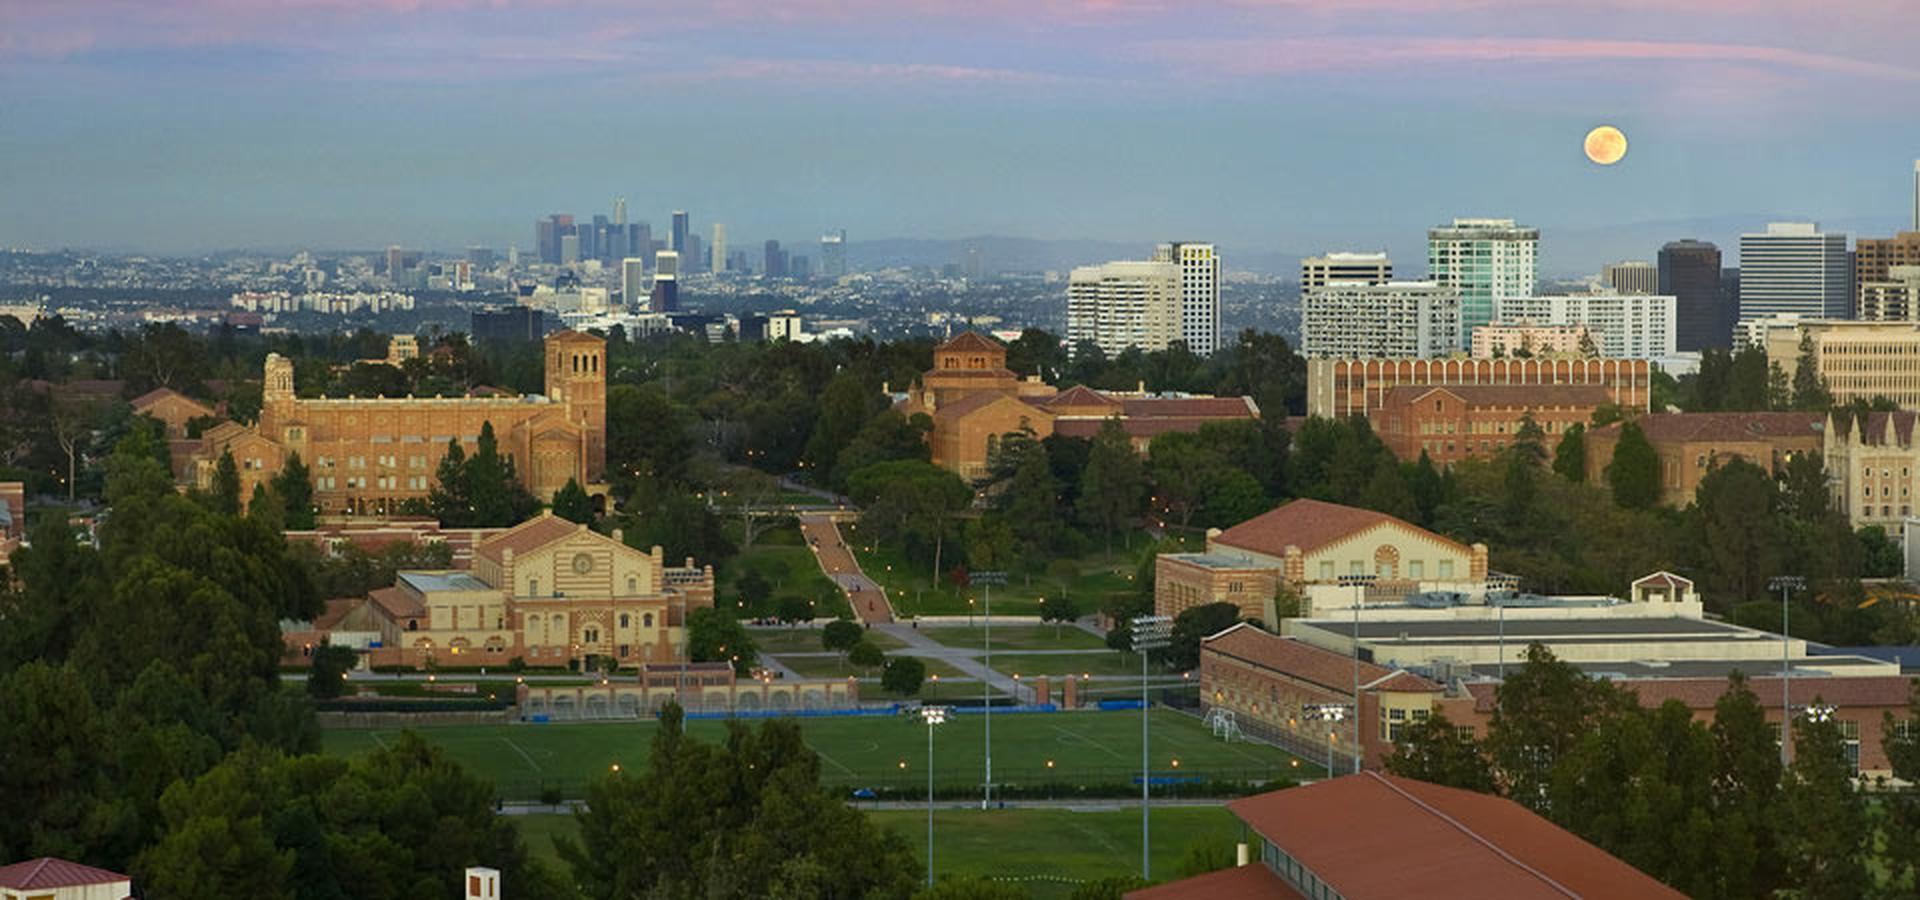 University Of California, Los Angeles Hd Wallpaper - Ucla Downtown Los Angeles , HD Wallpaper & Backgrounds